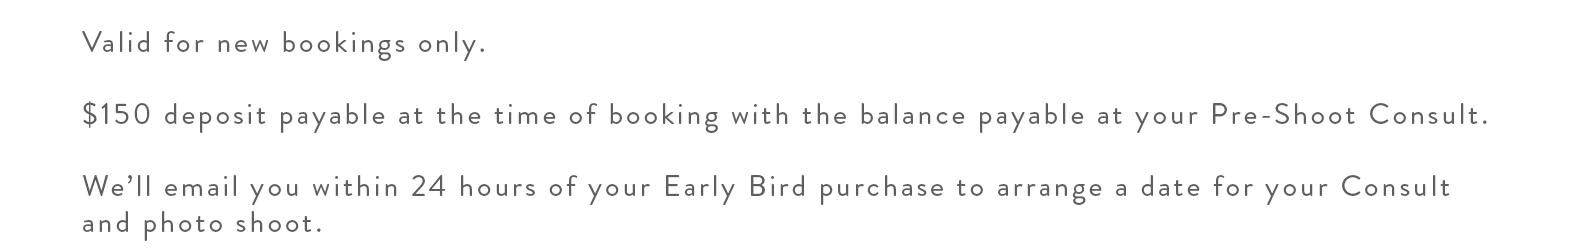 Early Bird Notes.jpg